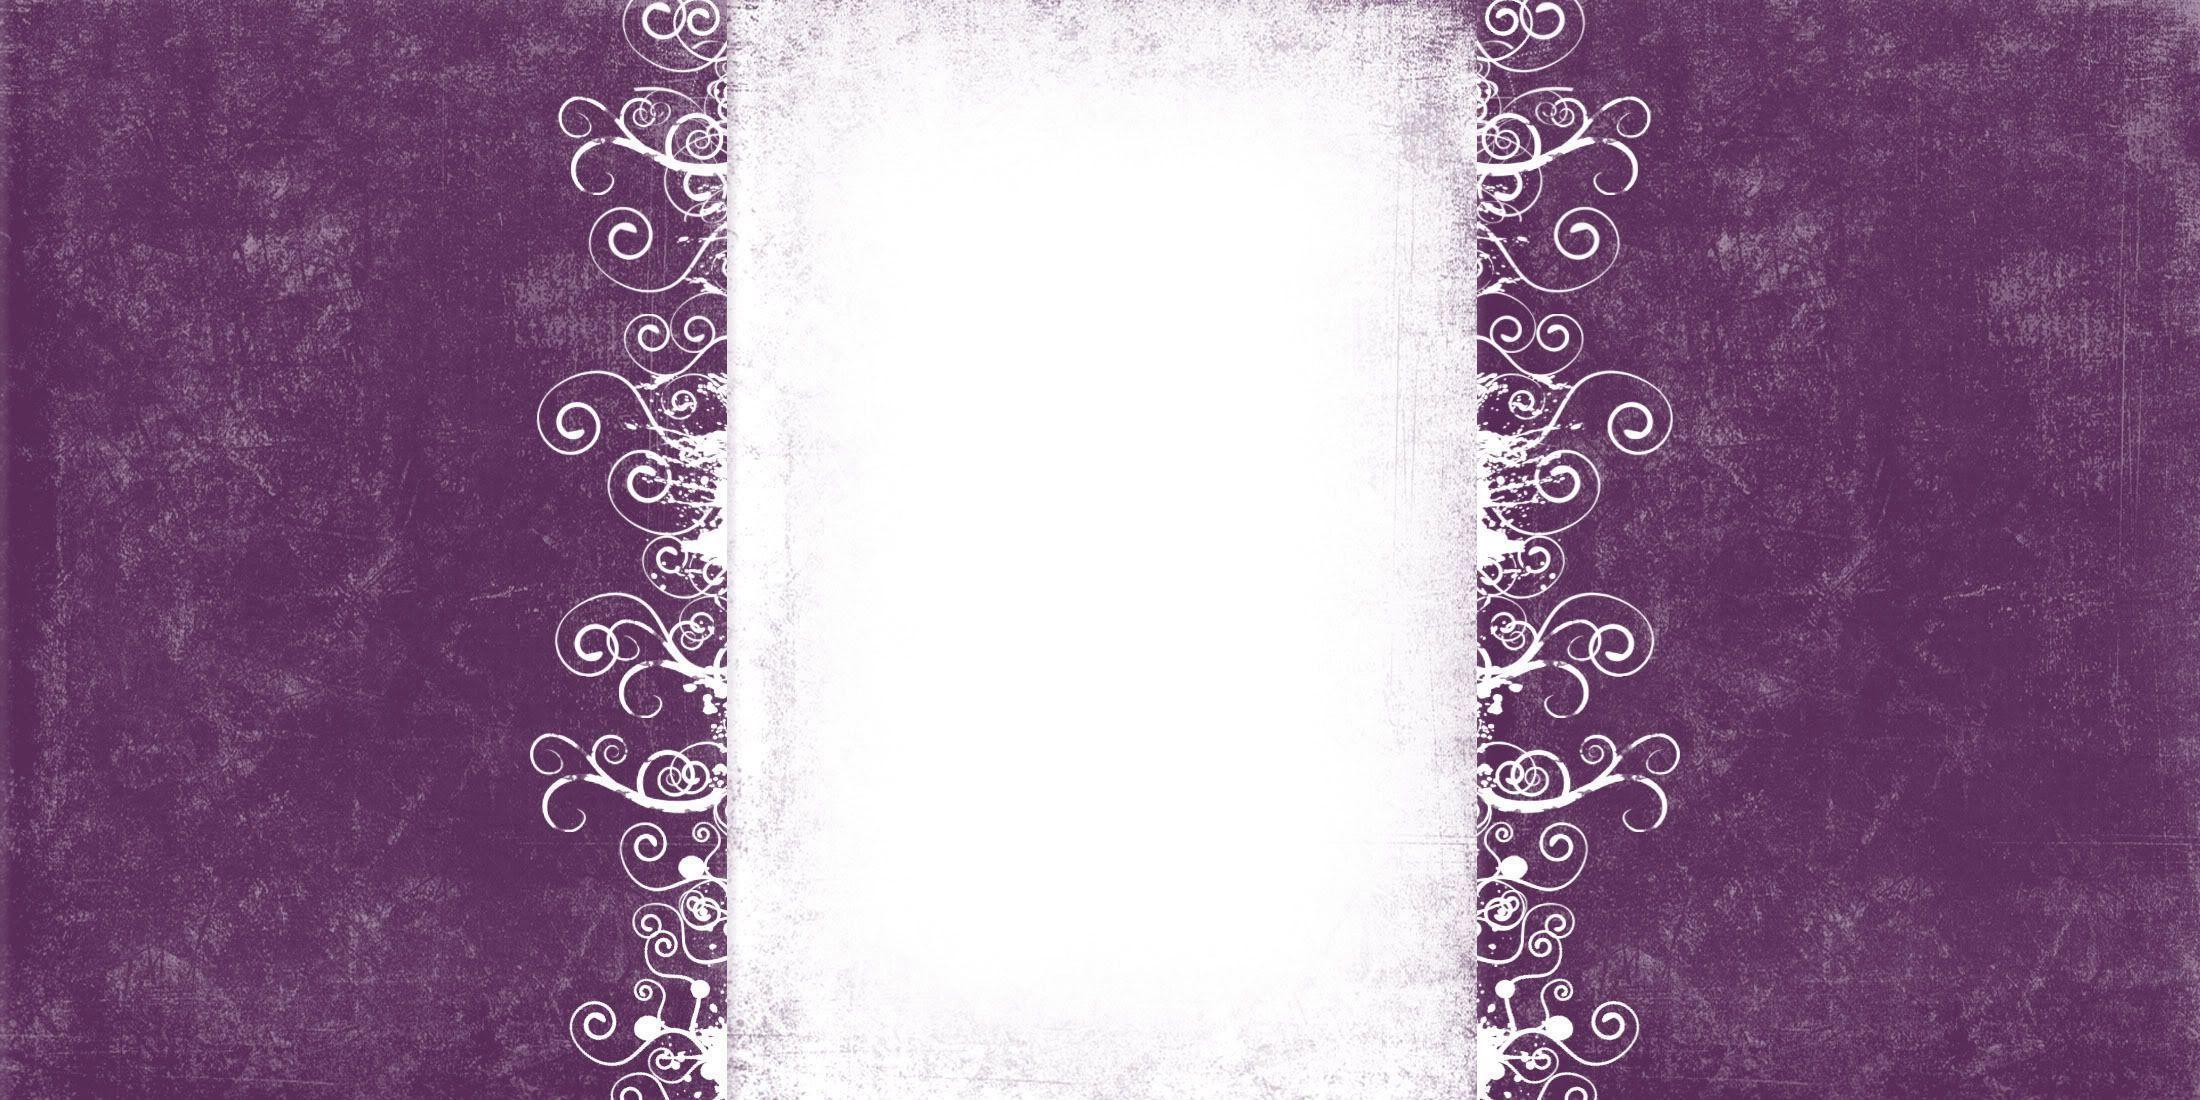 Purple Swirl Backgrounds - Wallpaper Cave